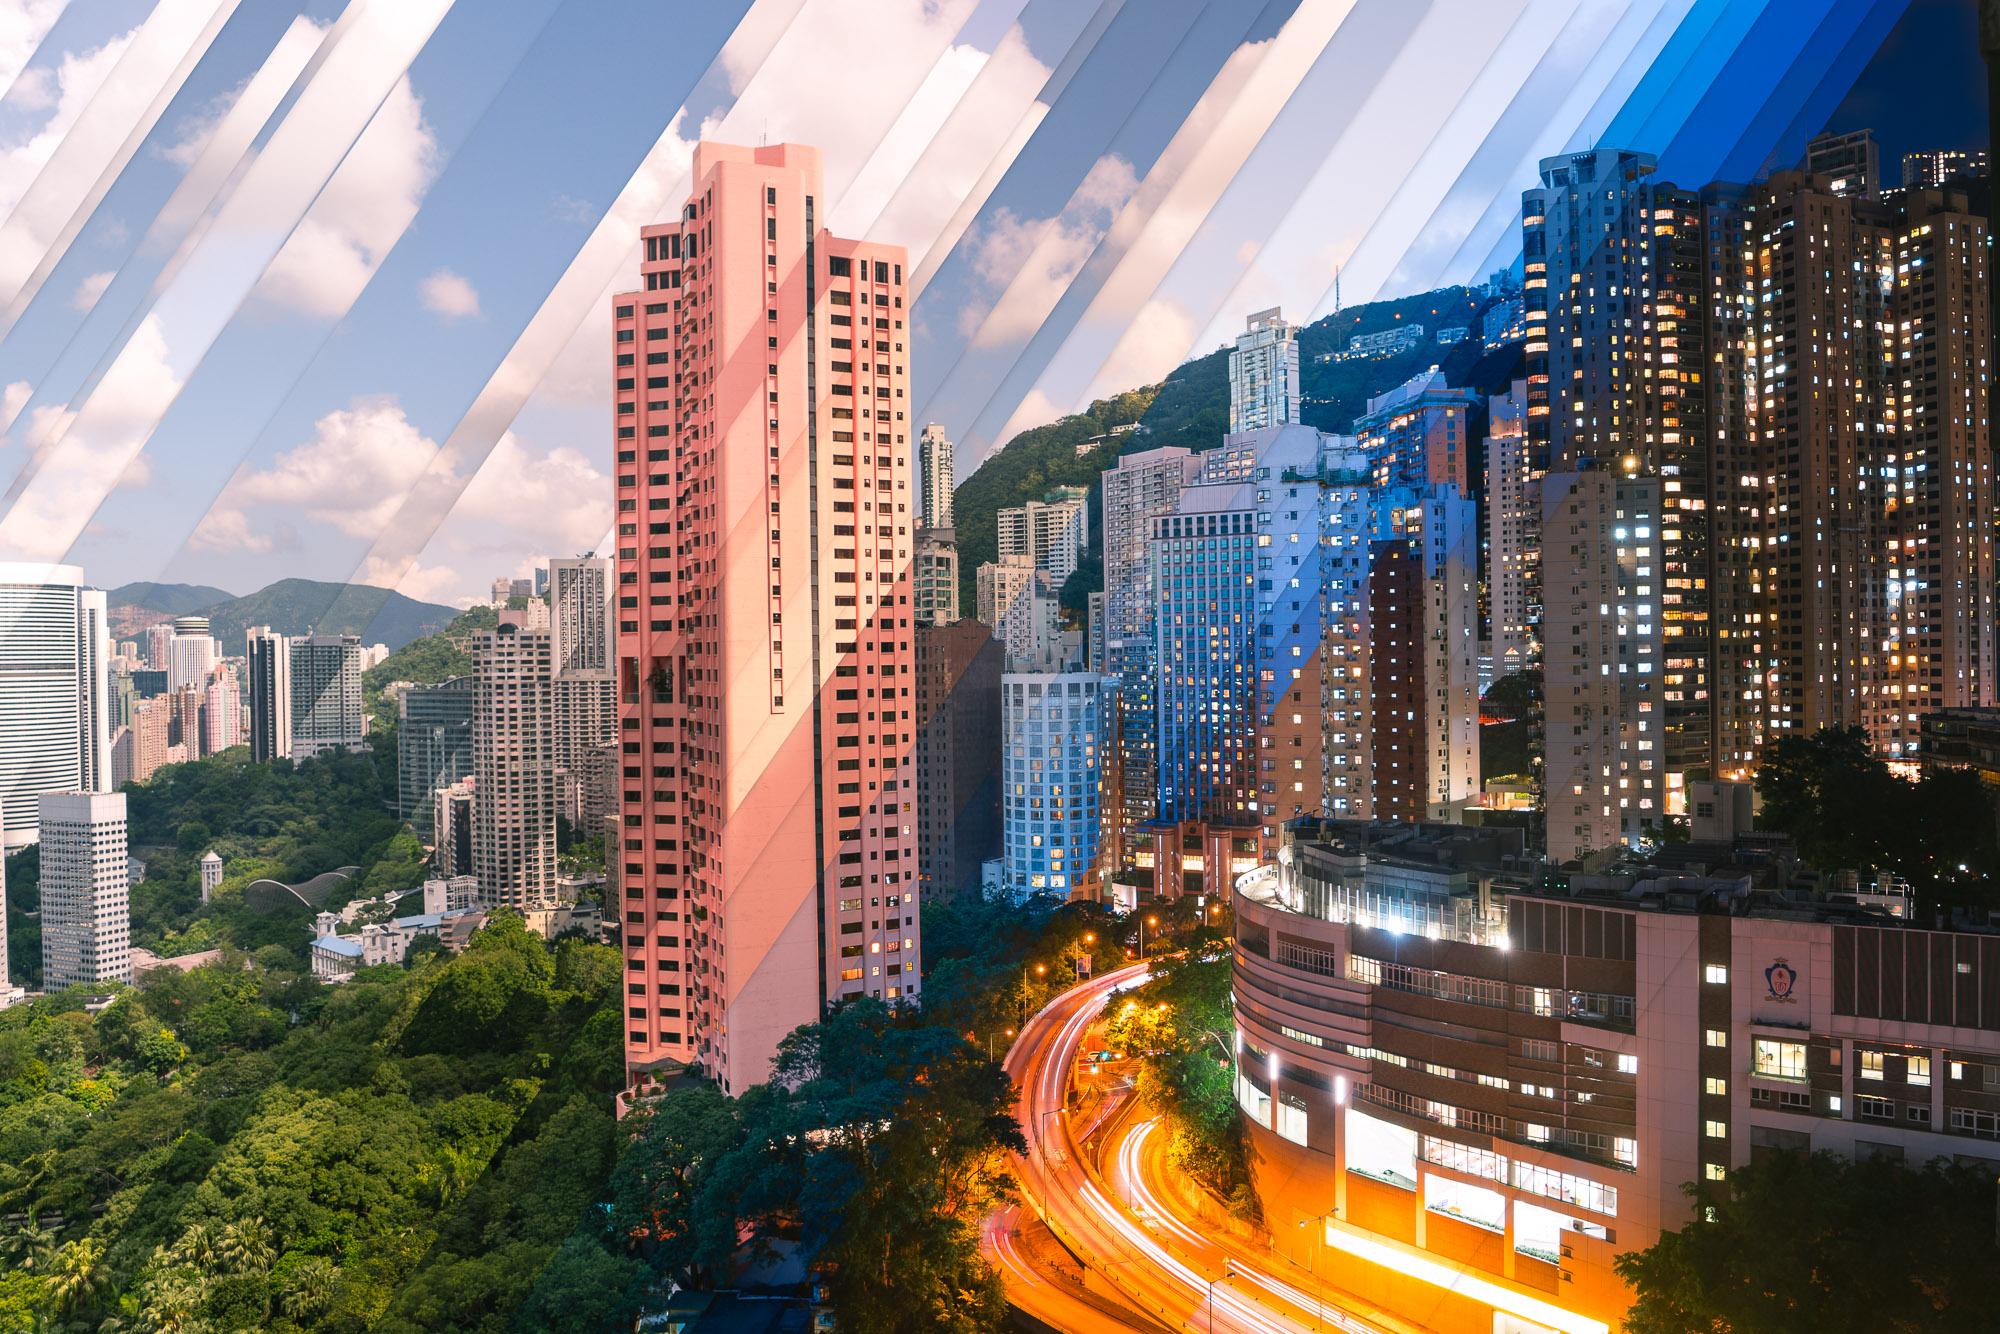 Timeslice Hong Kong in 27 photos